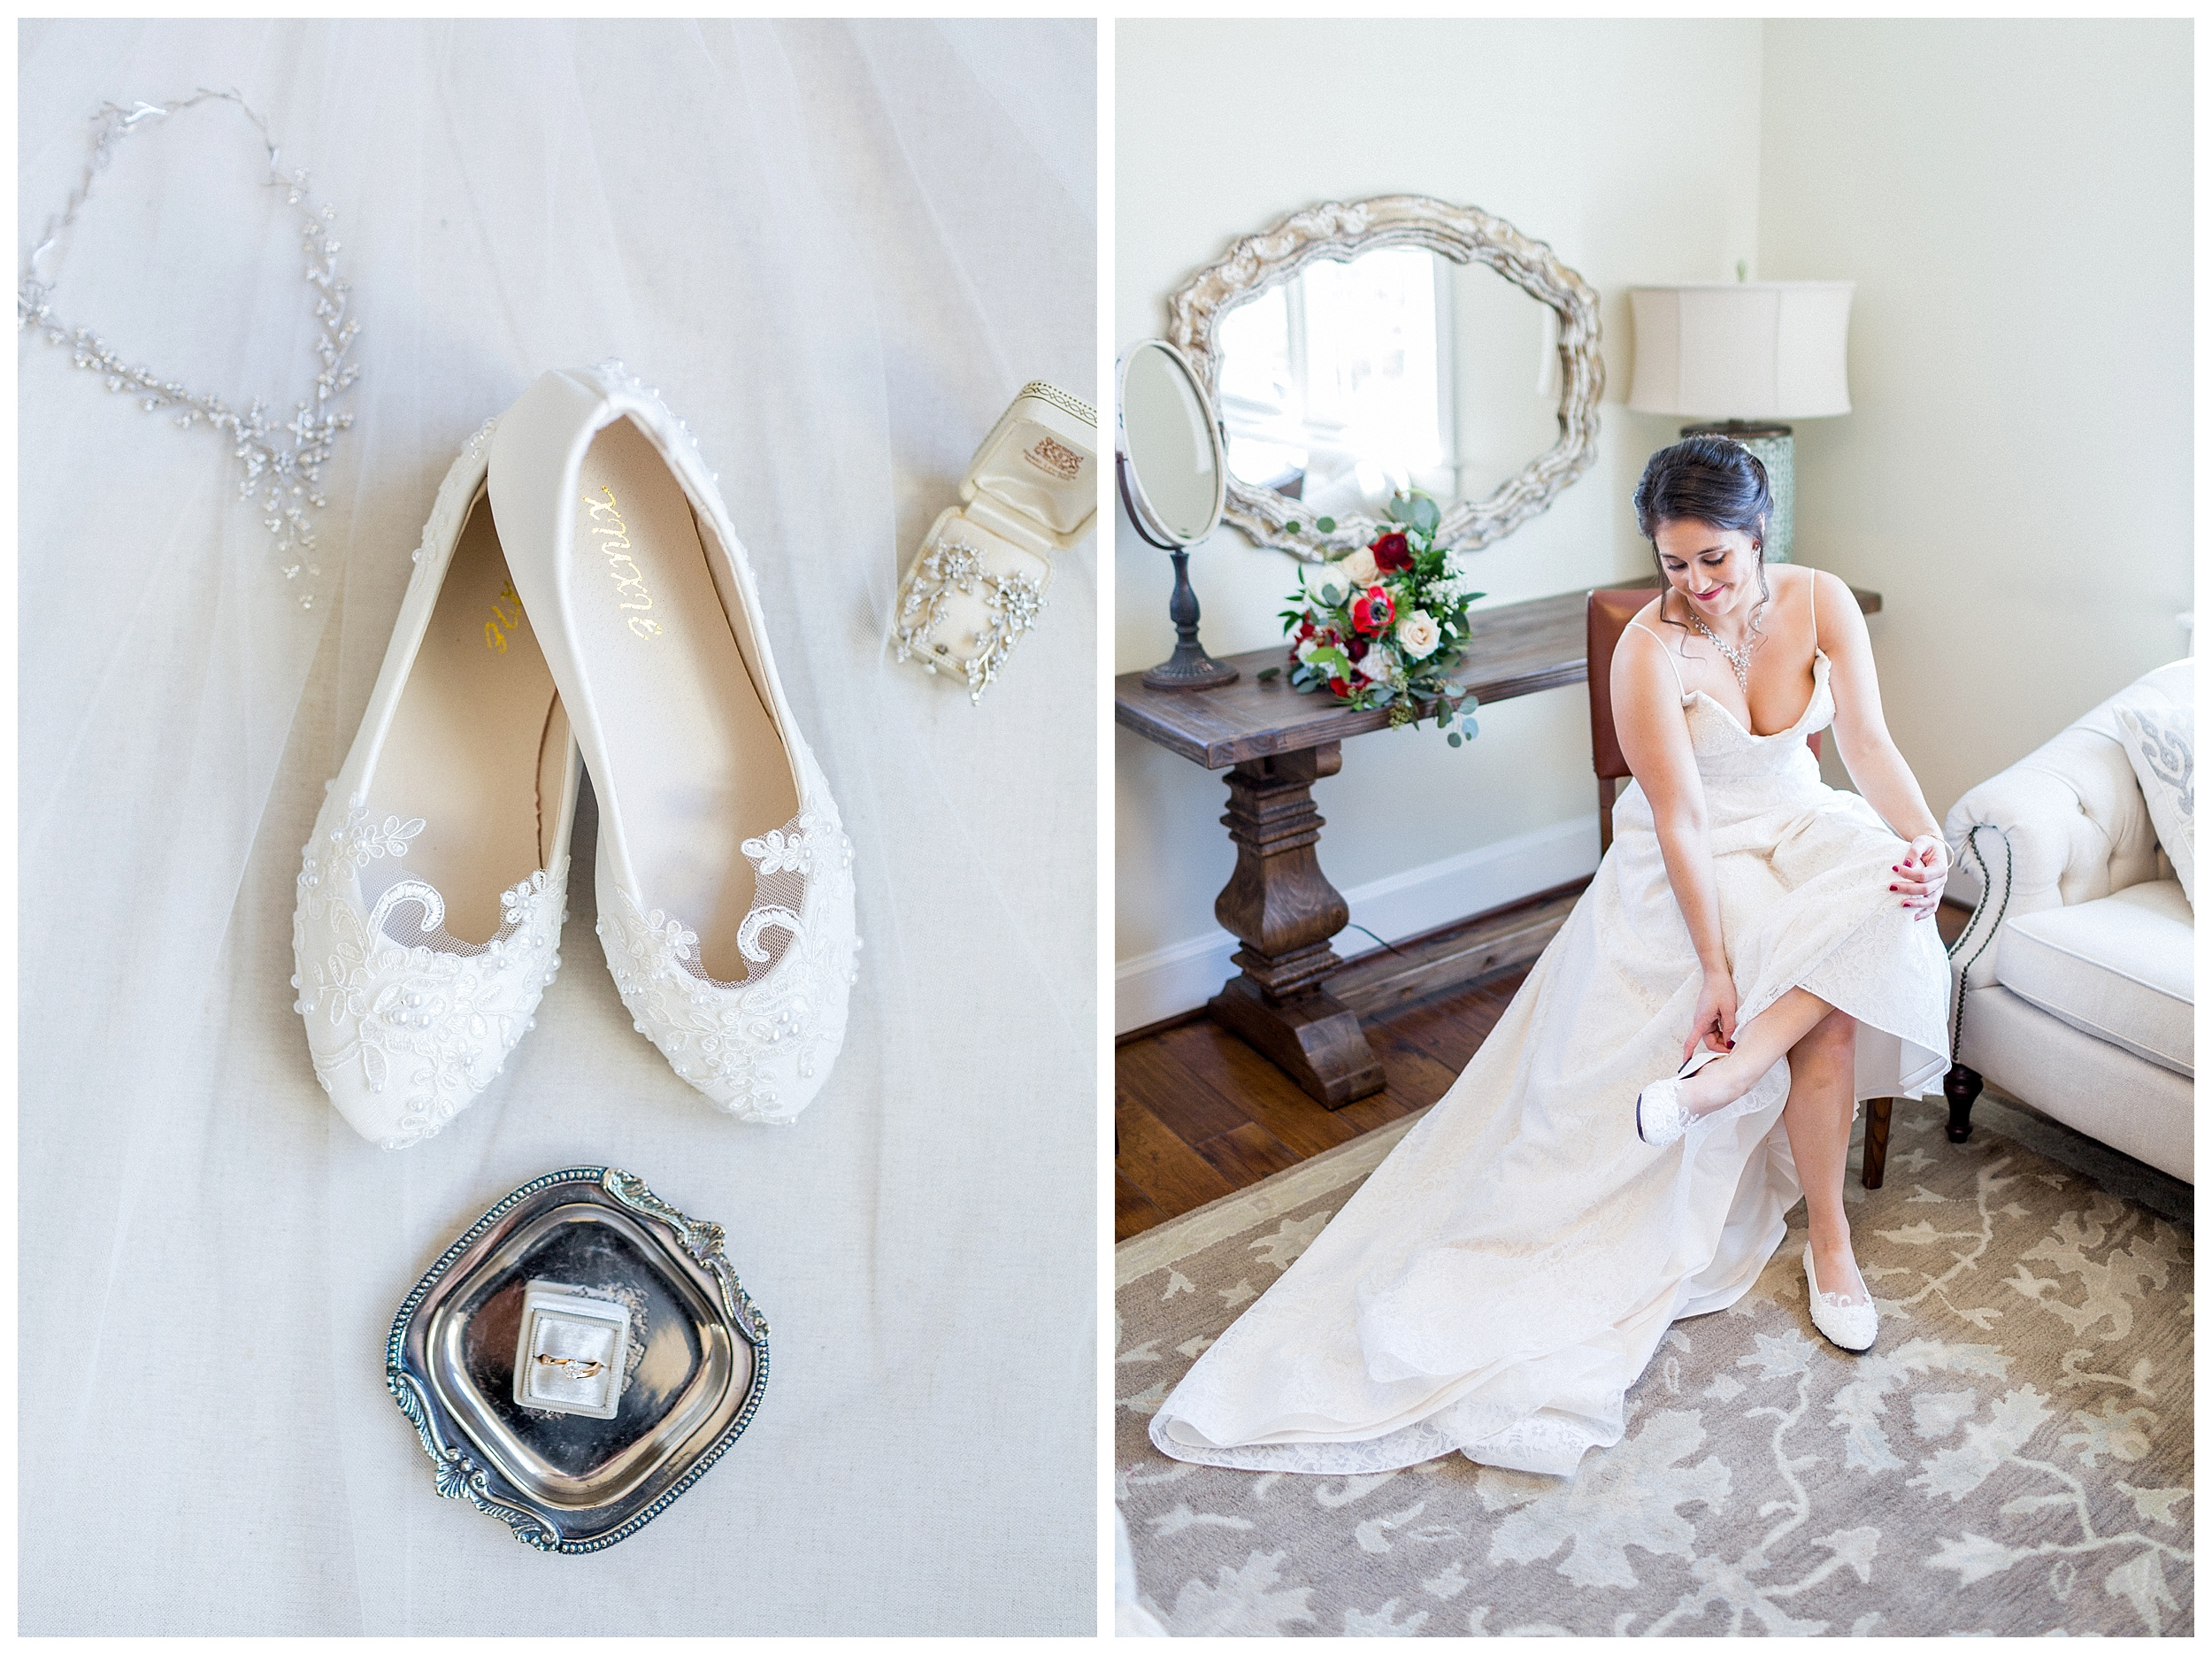 Stone Tower Winery Wedding | Virginia Winter Wedding | VA Wedding Photographer Kir Tuben_0020.jpg